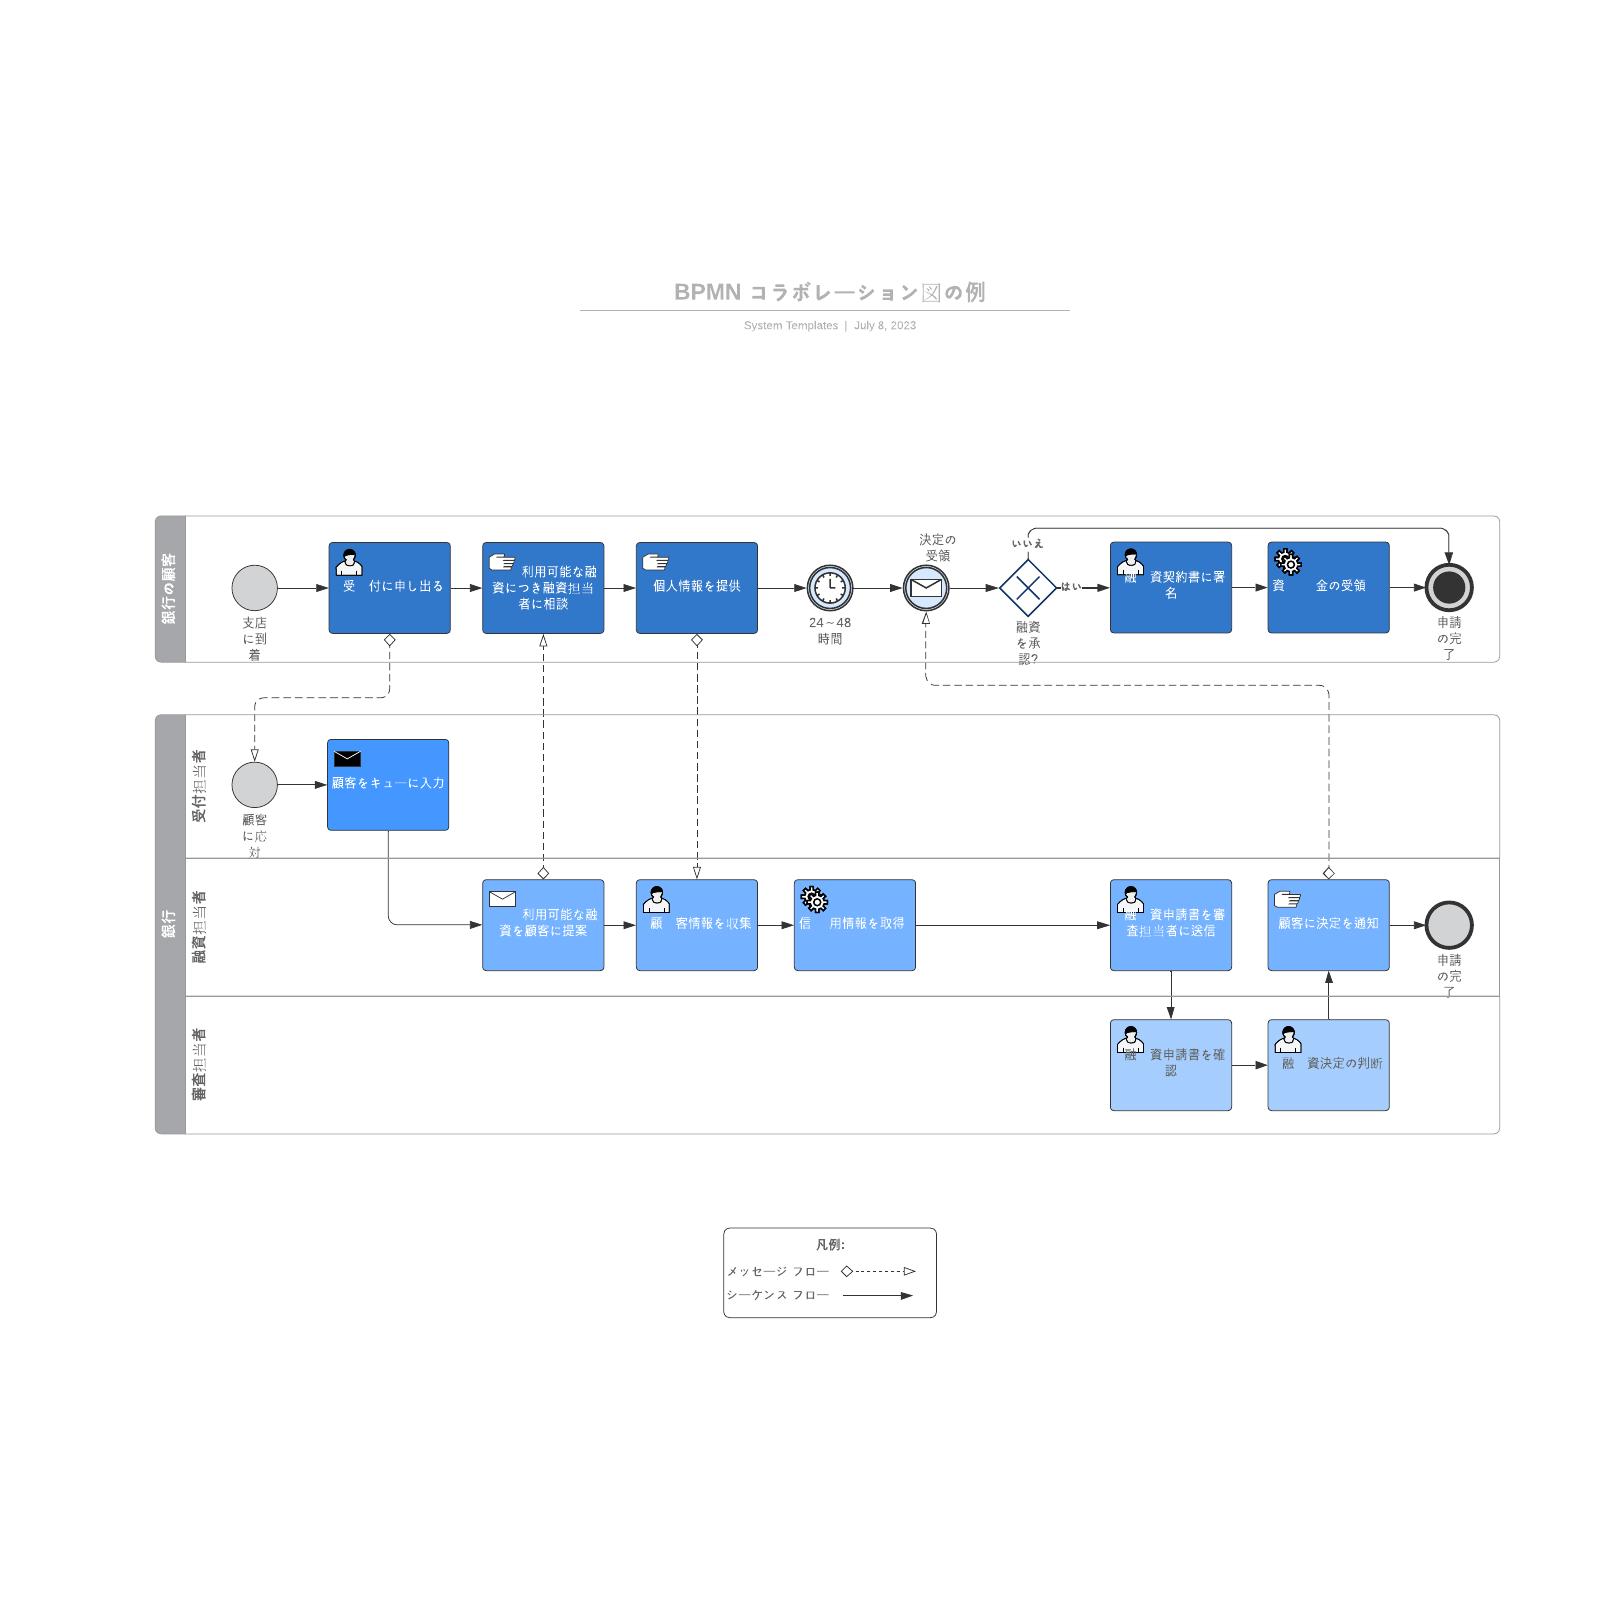 BPMN コラボレーション図の例